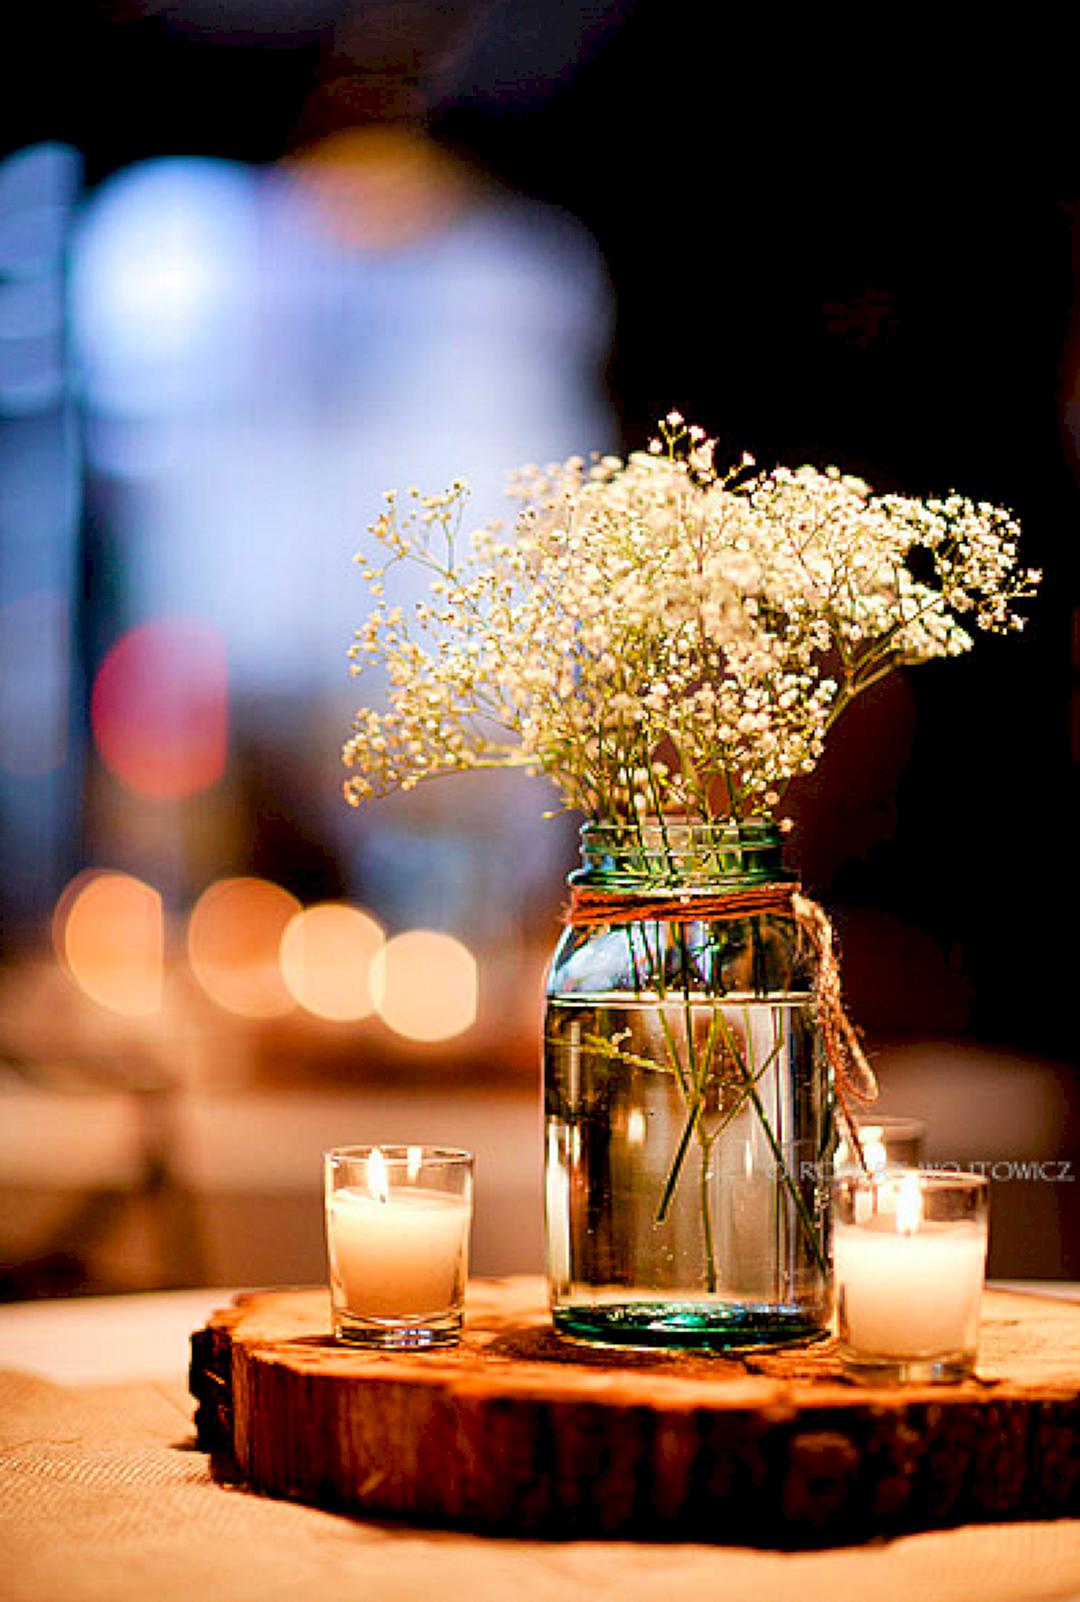 99 Diy Fabulous Rustic Cheap Wedding Centerpieces Ideas Inexpensive Wedding Centerpieces Cheap Wedding Centerpieces Country Wedding Table Decoration